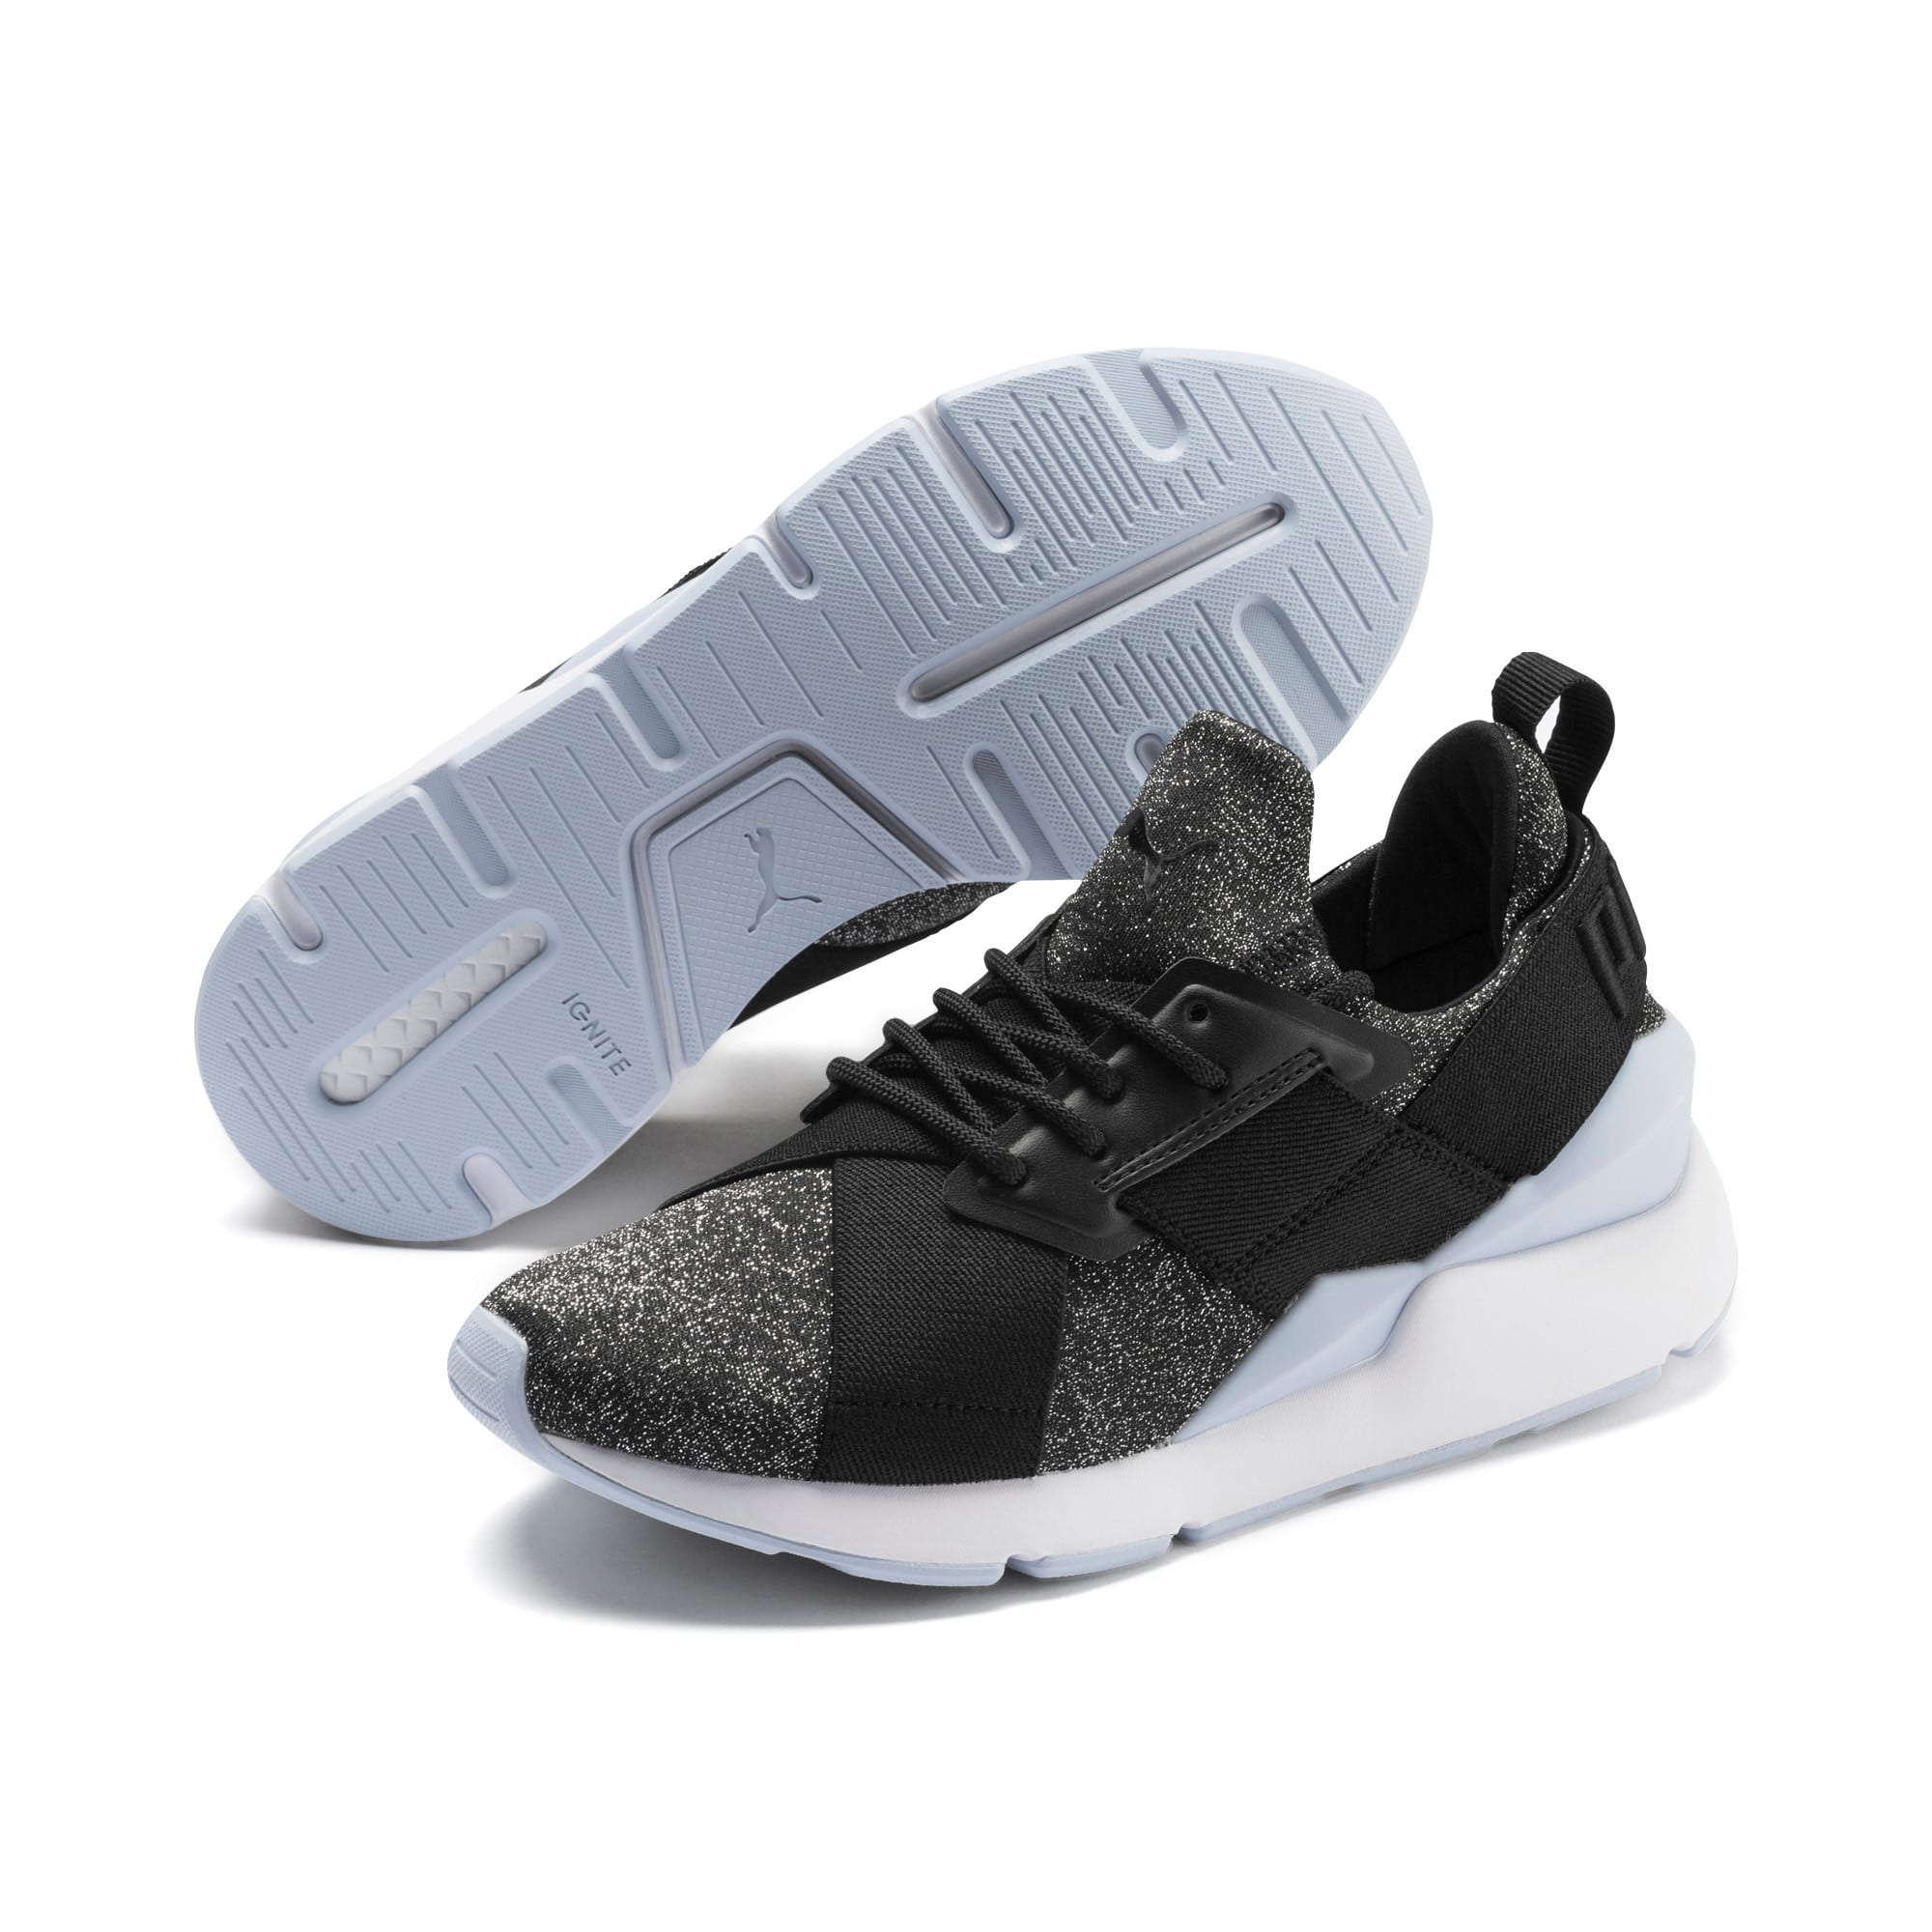 Thumbnail 2 of Muse Shift Sneakers JR, Puma Black-Heather, medium